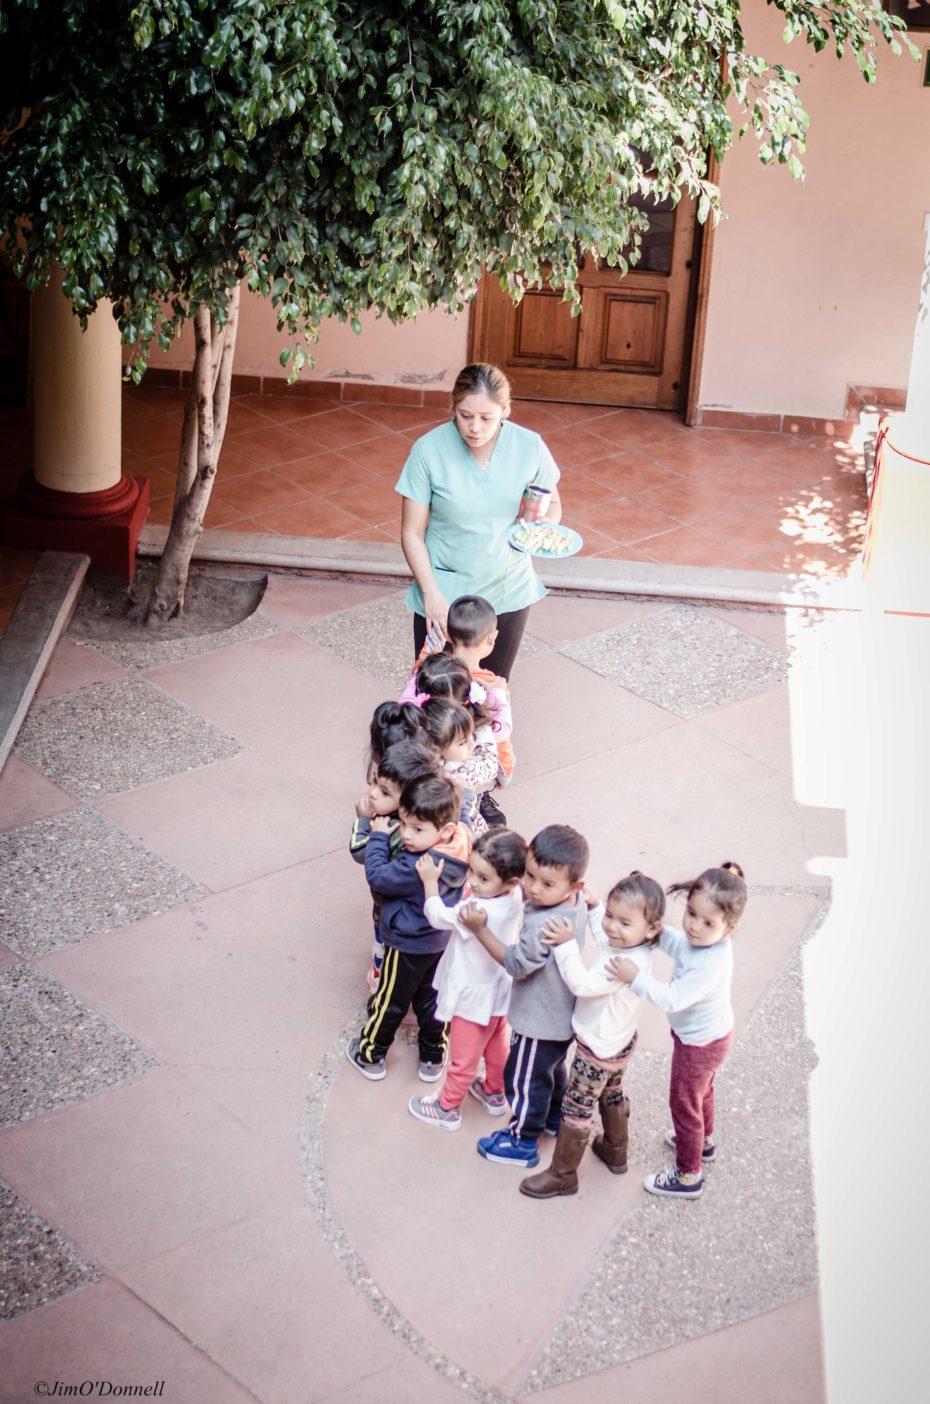 El CENTRO INFANTIL DE LOS ÁNGELES